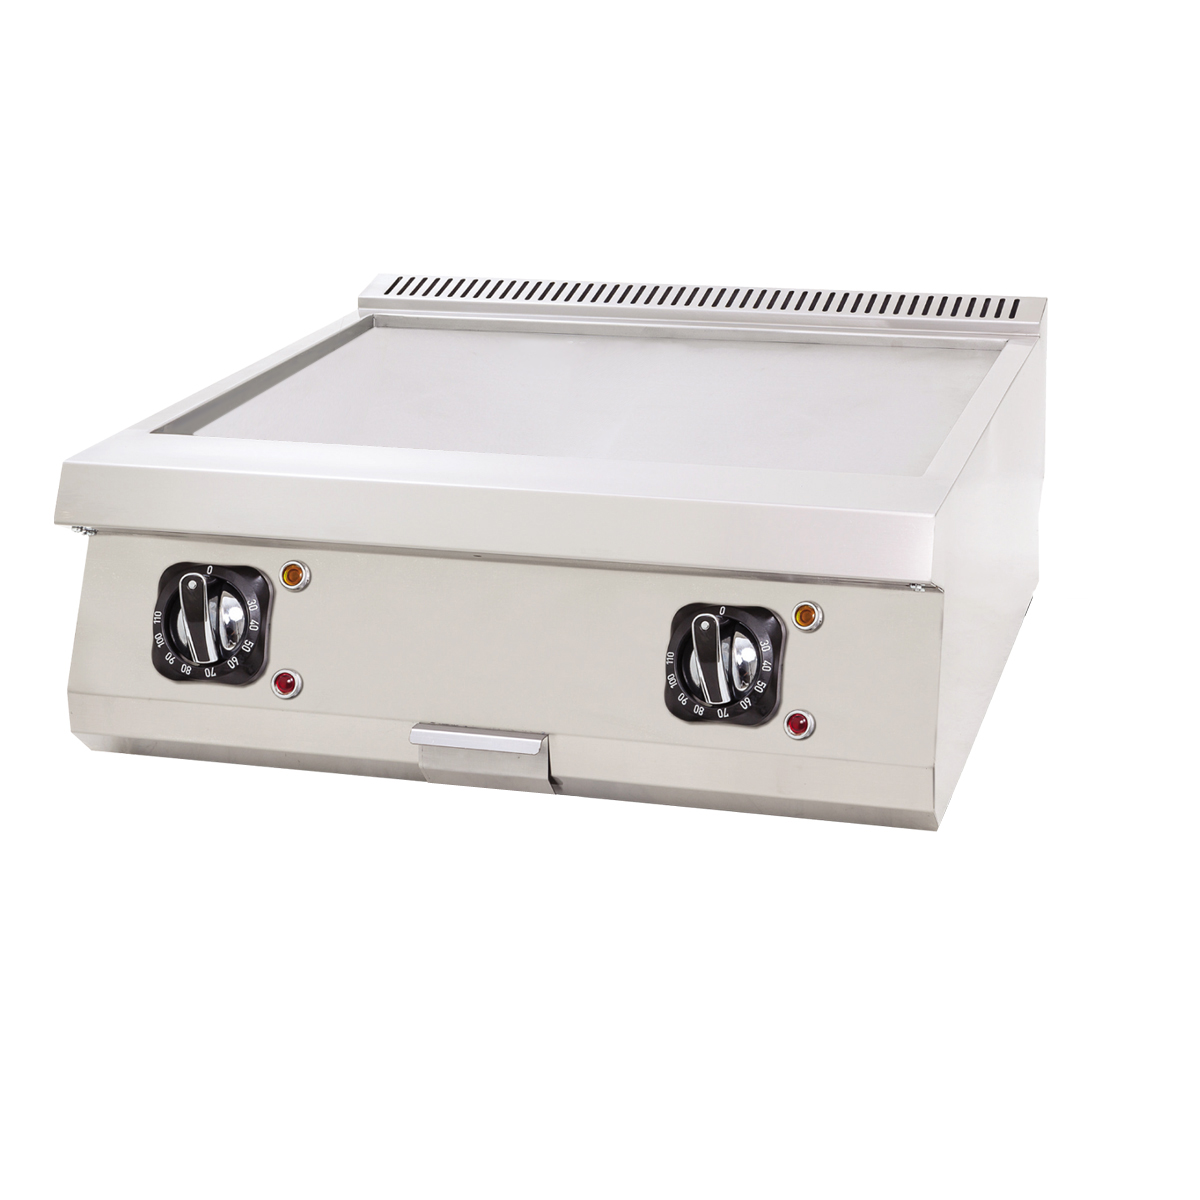 Elektrikli Izgara Düz - 80x60